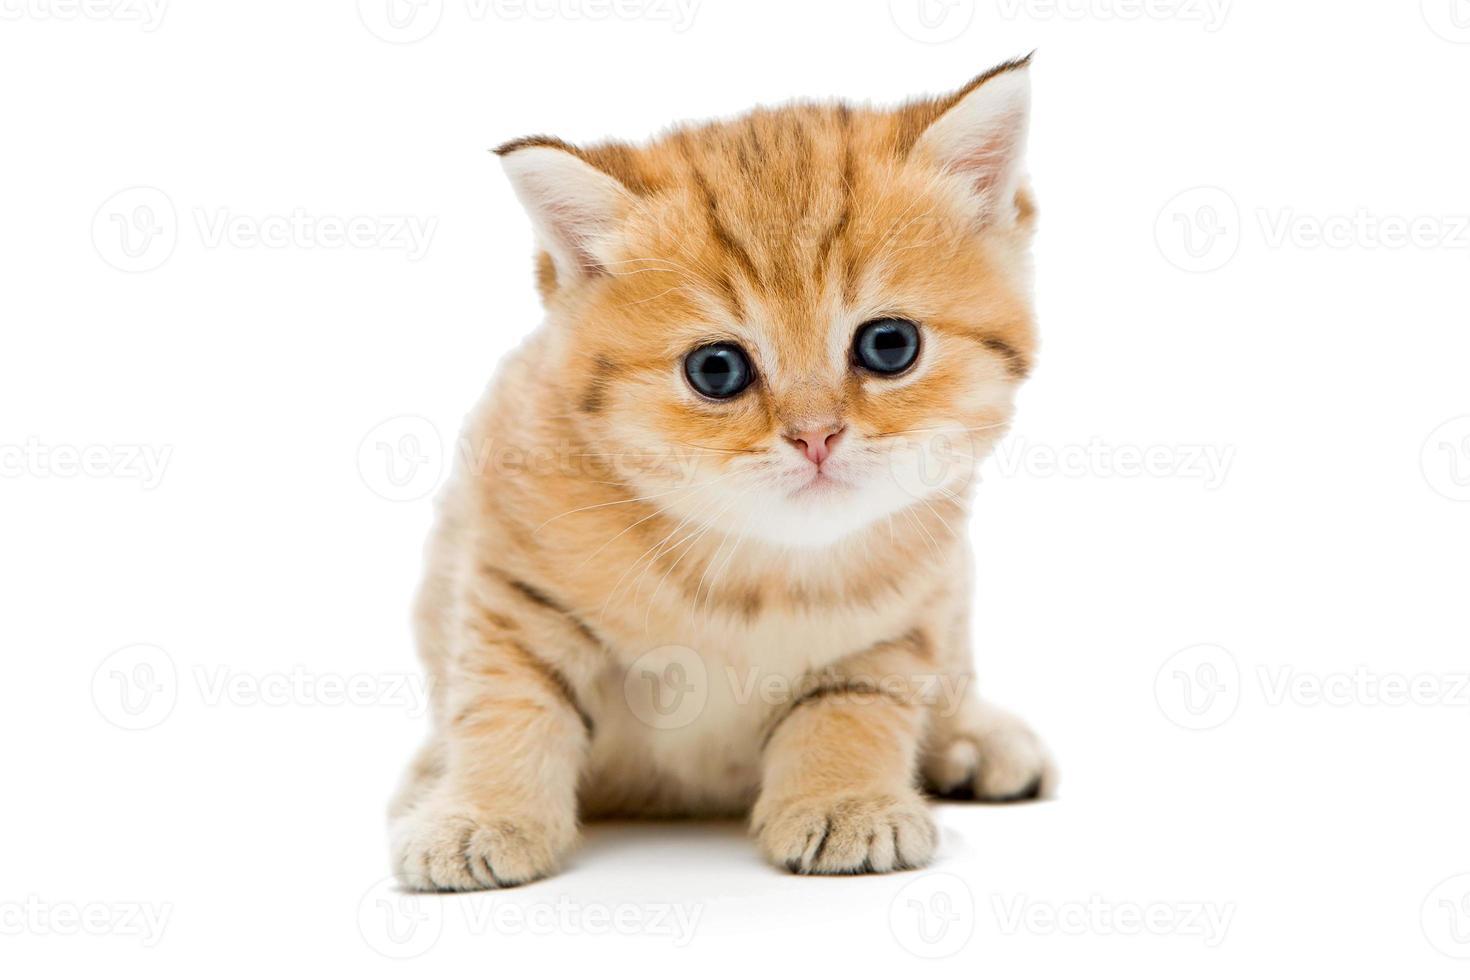 brittisk kattunge på vit bakgrund foto